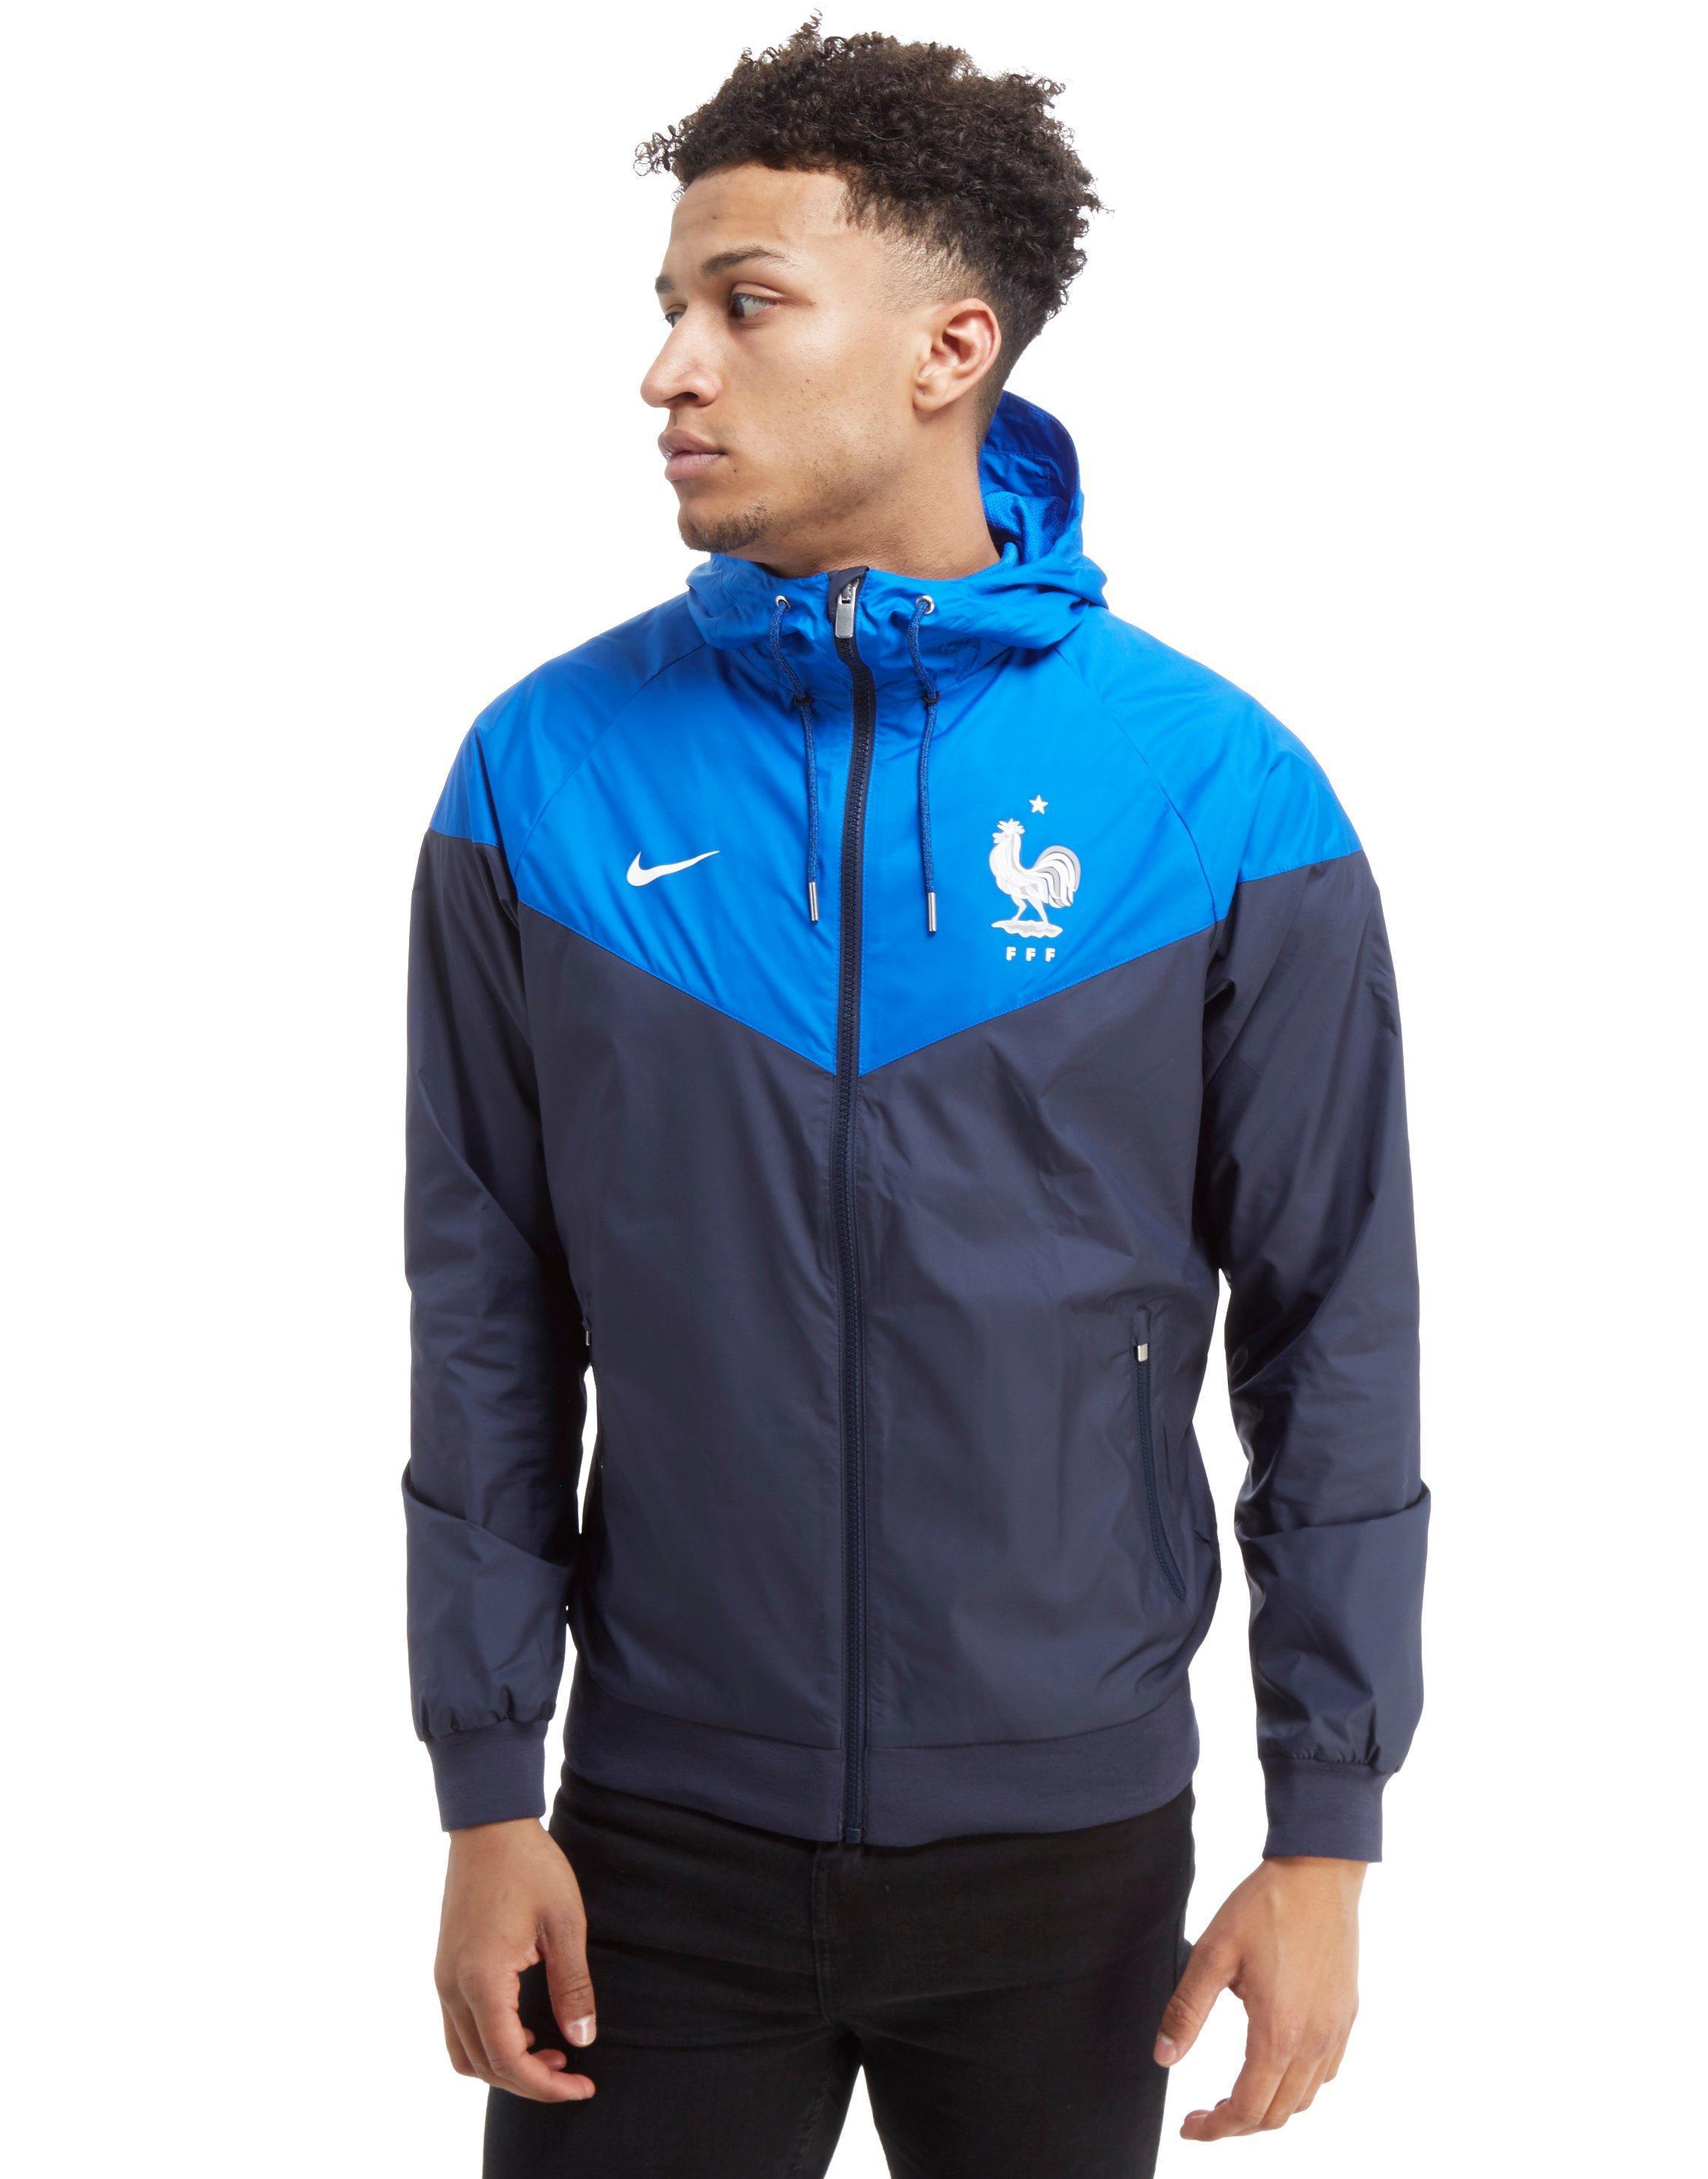 on sale 82d58 970a5 Nike France Windrunner in Blue for Men - Lyst